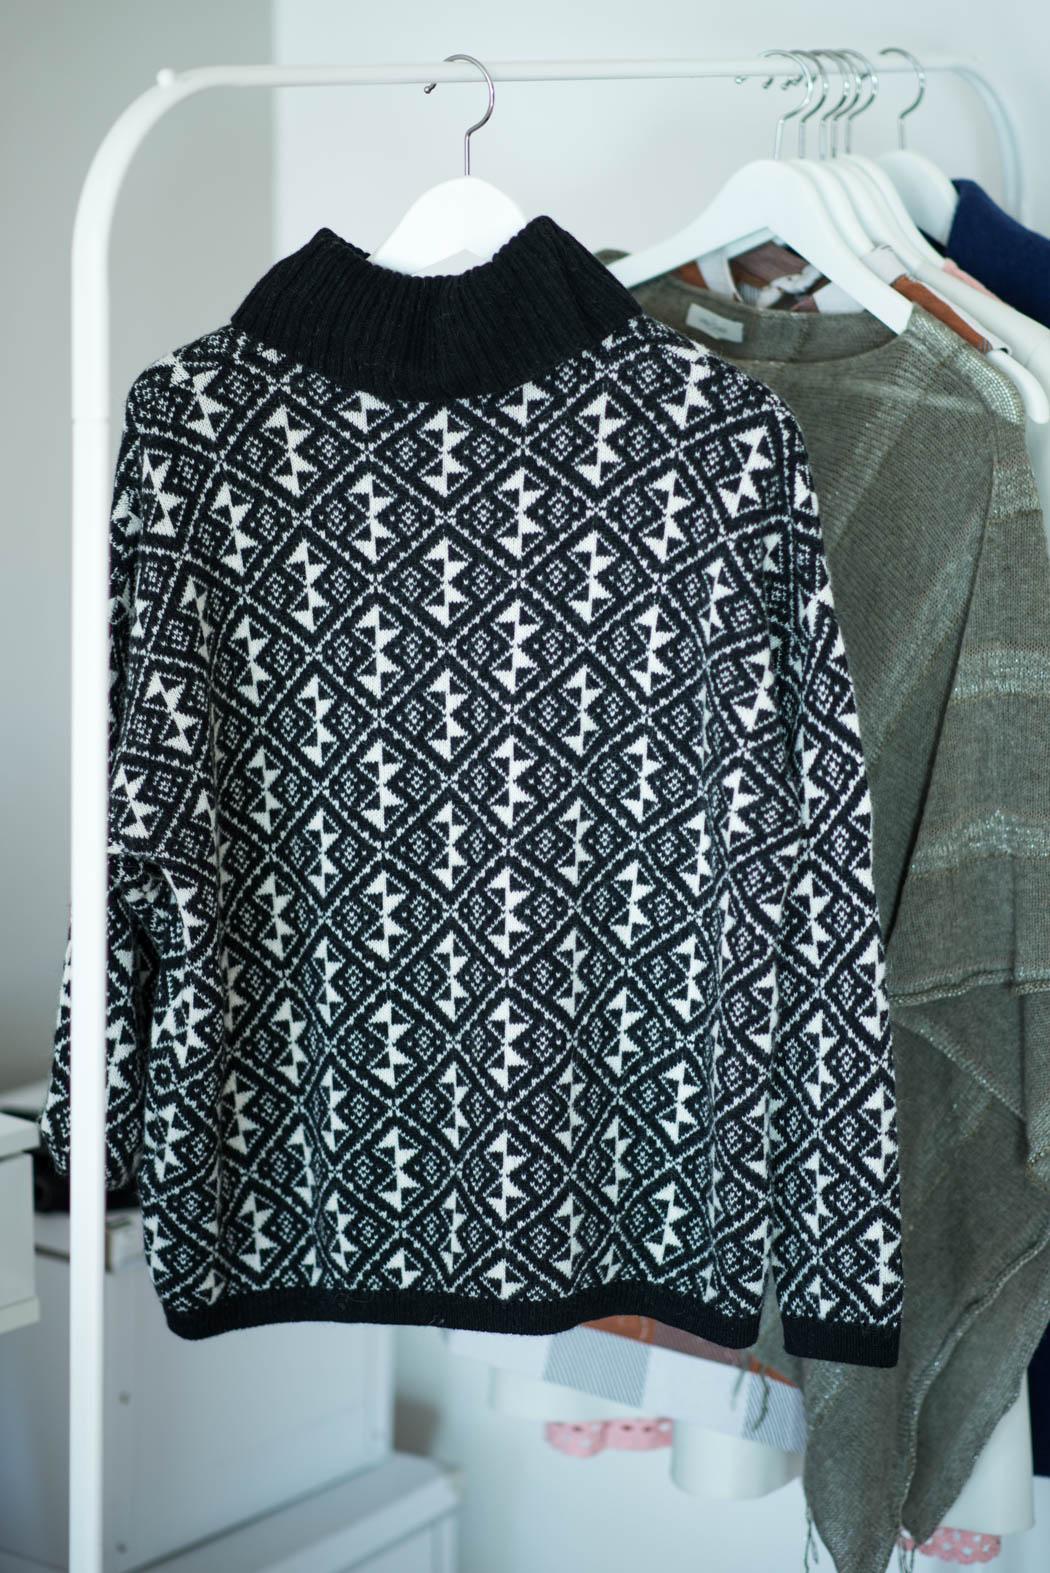 Shoppinghaul-Lindarella-Fashionblogger-München-Deutschland-Fashionblog-3